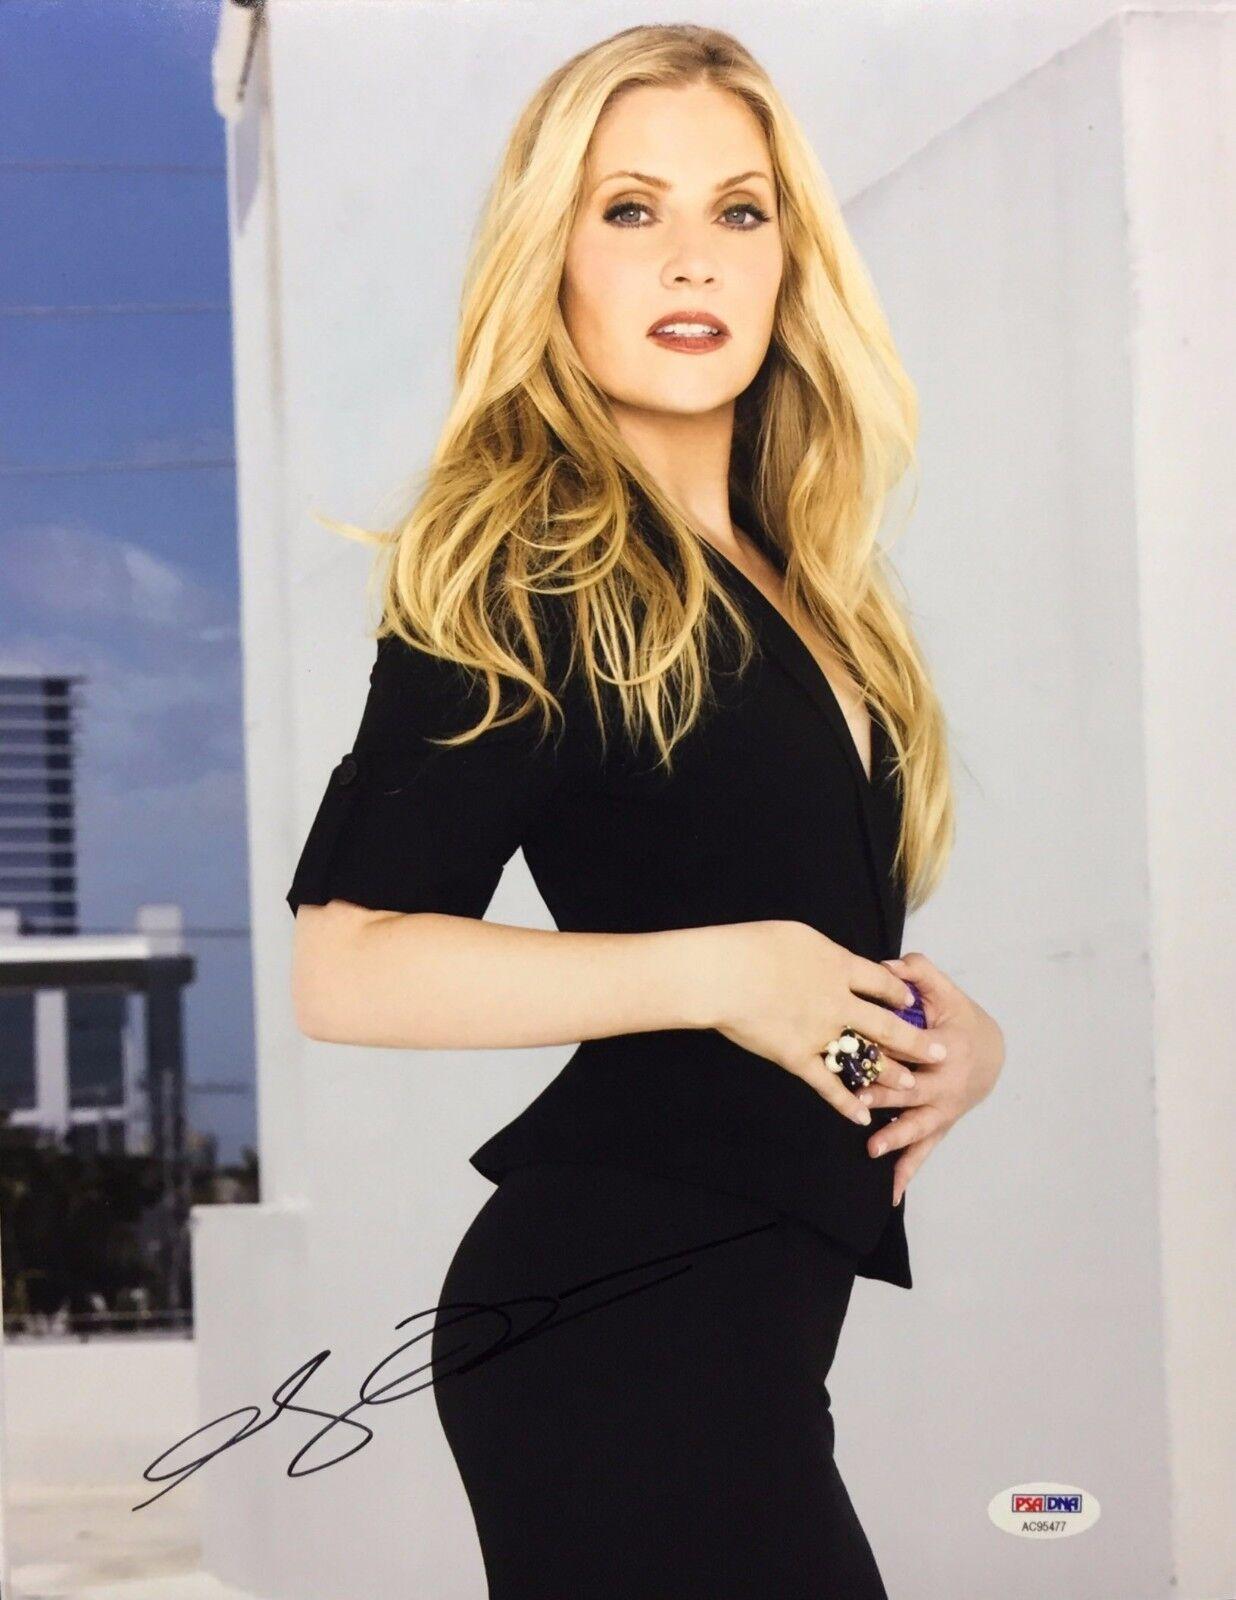 Emily Procter Signed 11x14 Photo *Model *CSI Miami *Big Momma's House PSA